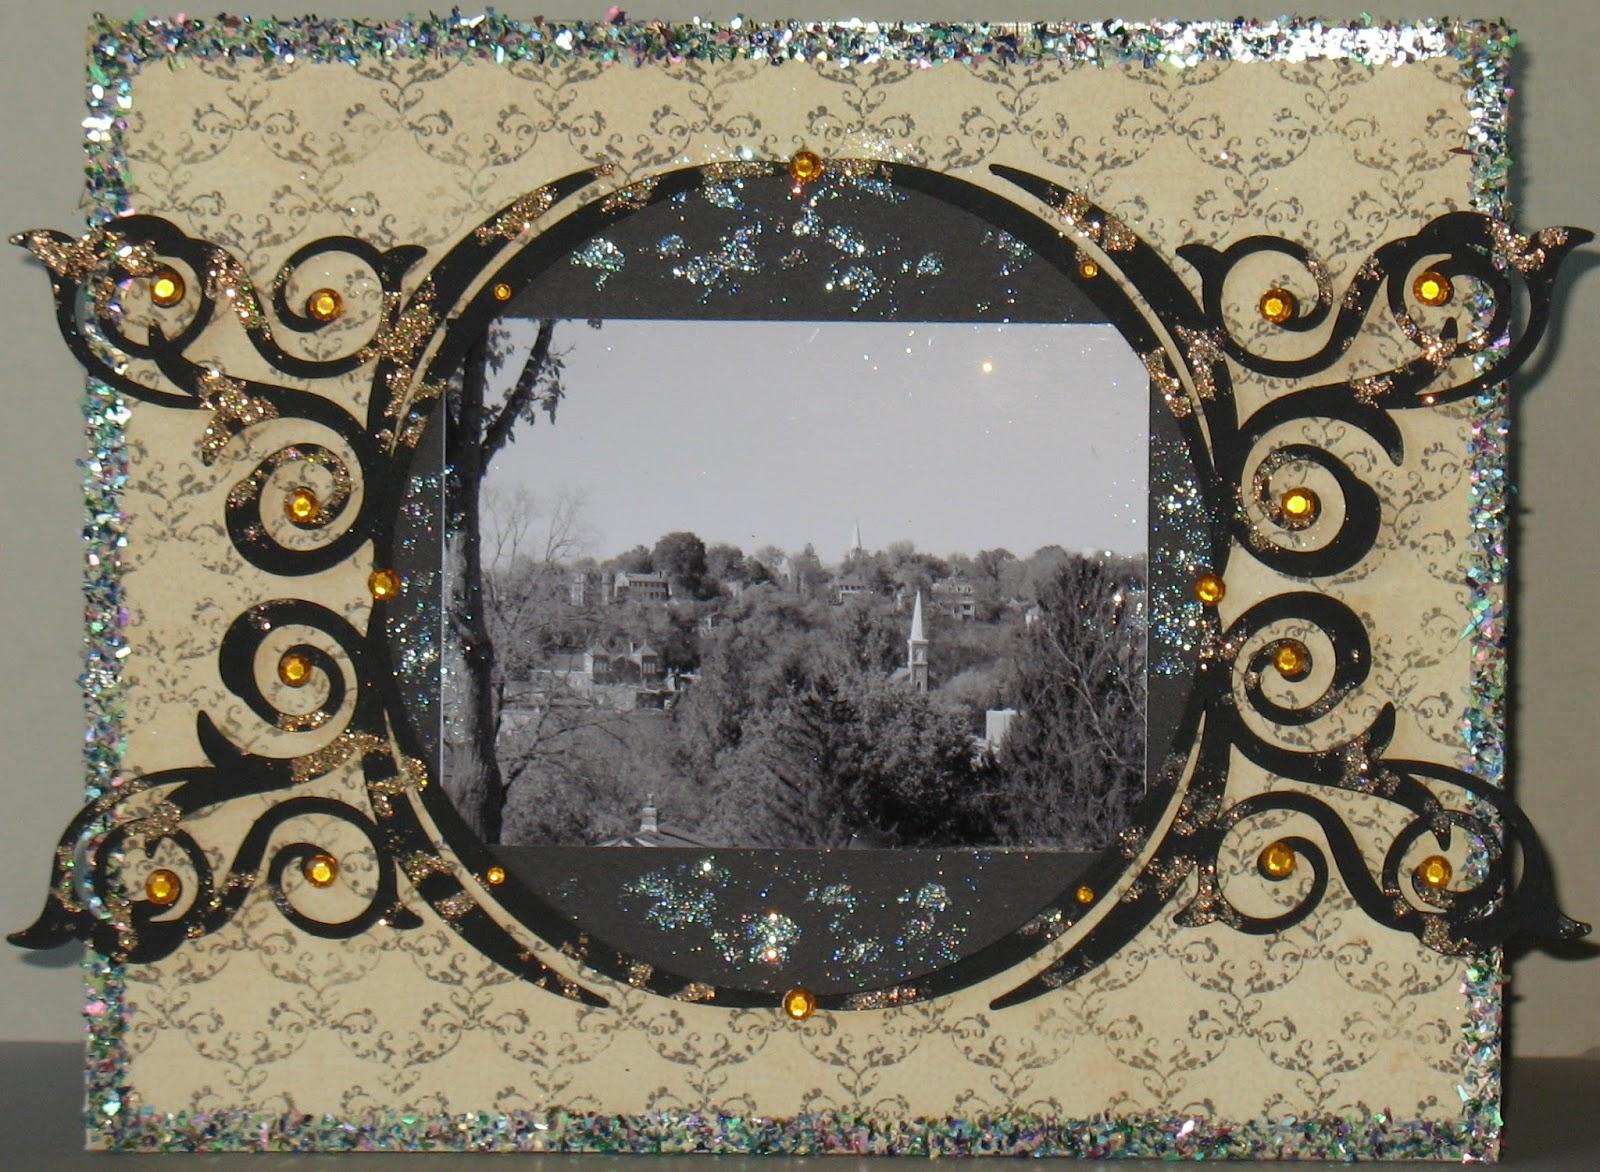 Artglitterblog Blinged Out Altered Photo Frame